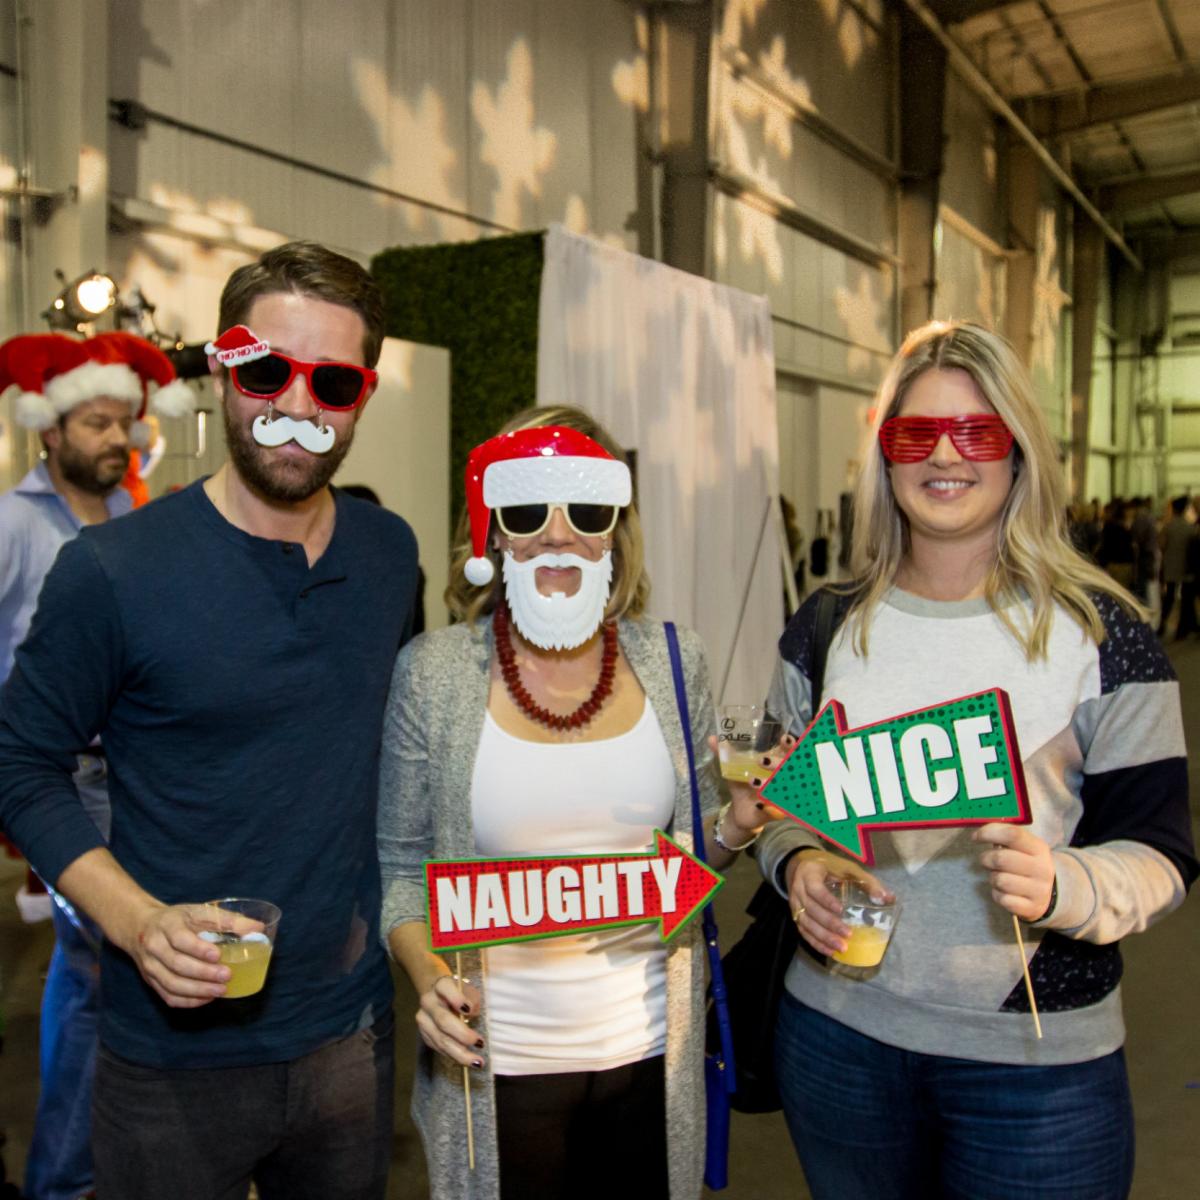 News, CM Holiday Pop-Up Shop, Dec. 2015, Brendan Smith, Sarah Oxley, Valerie Cline